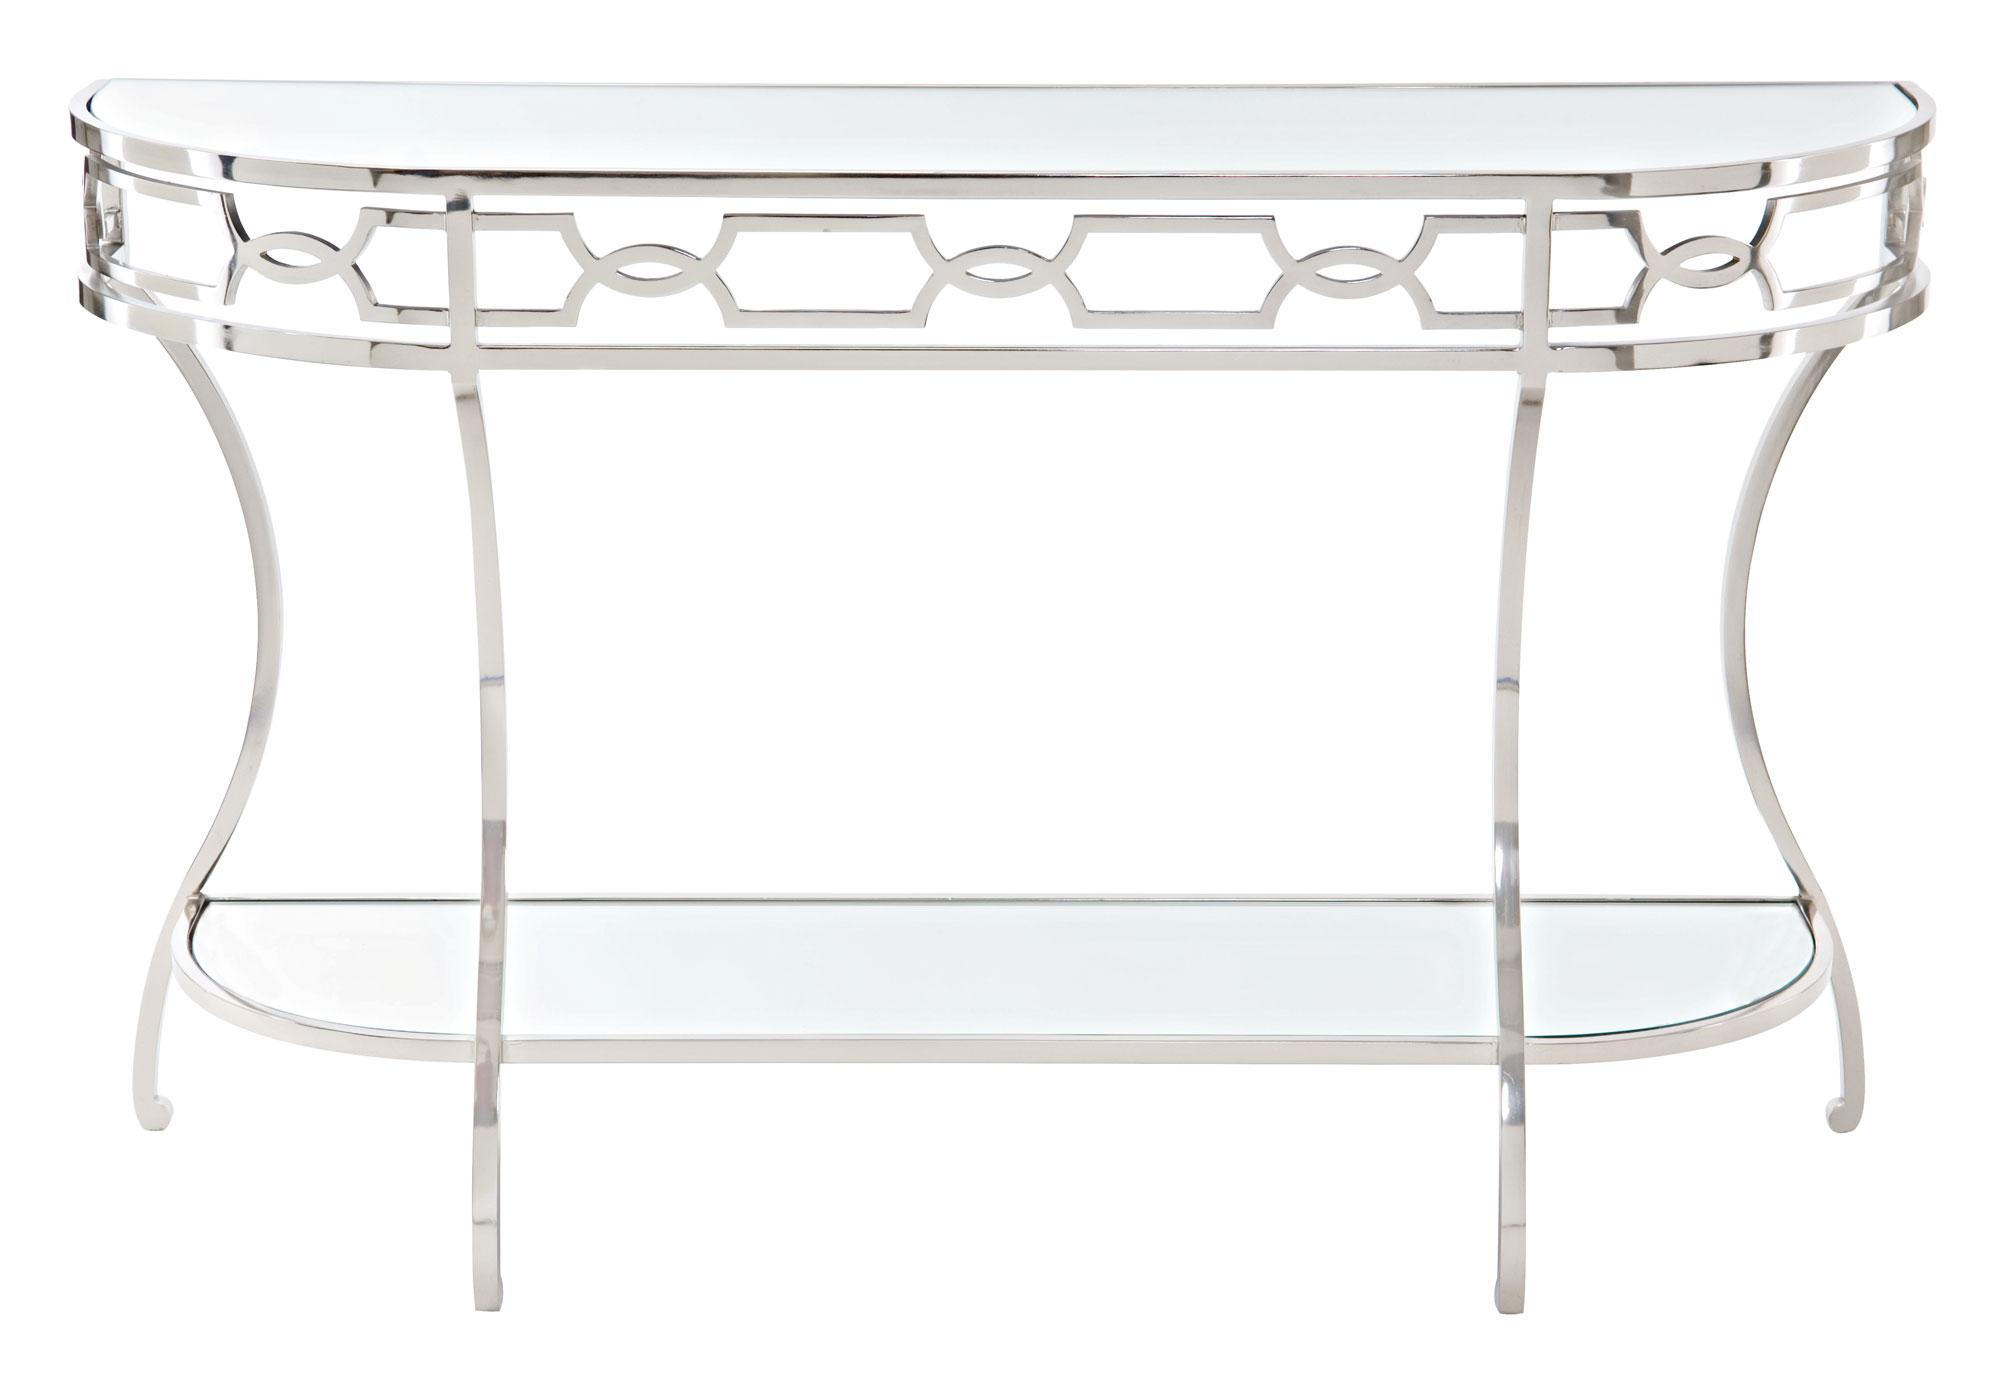 Bernhardt Criteria Metal Console Table - Item Number: 363-912